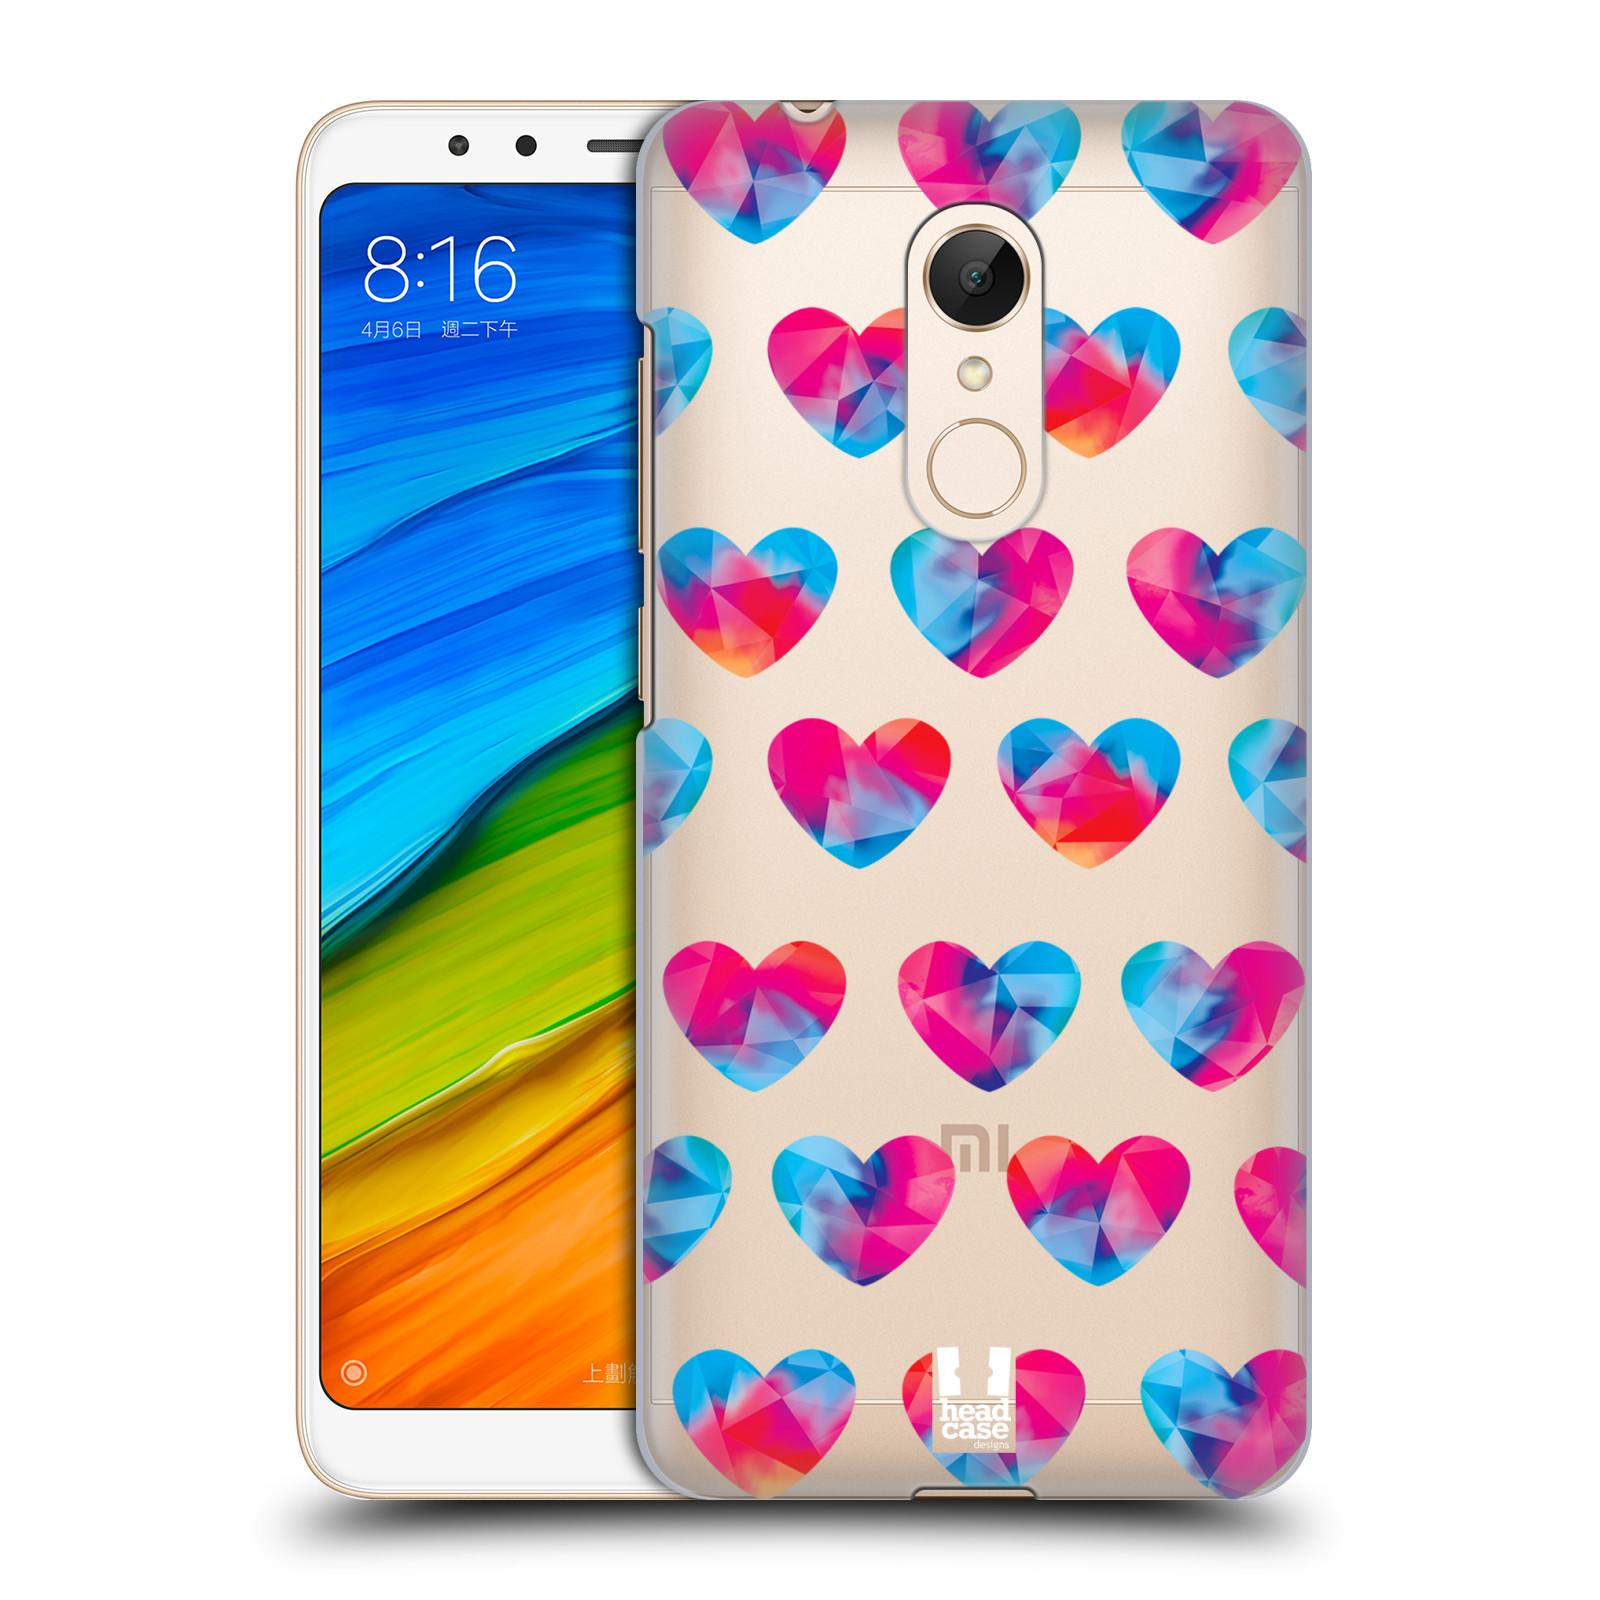 Plastové pouzdro na mobil Xiaomi Redmi 5 - Head Case - Srdíčka hrající barvami